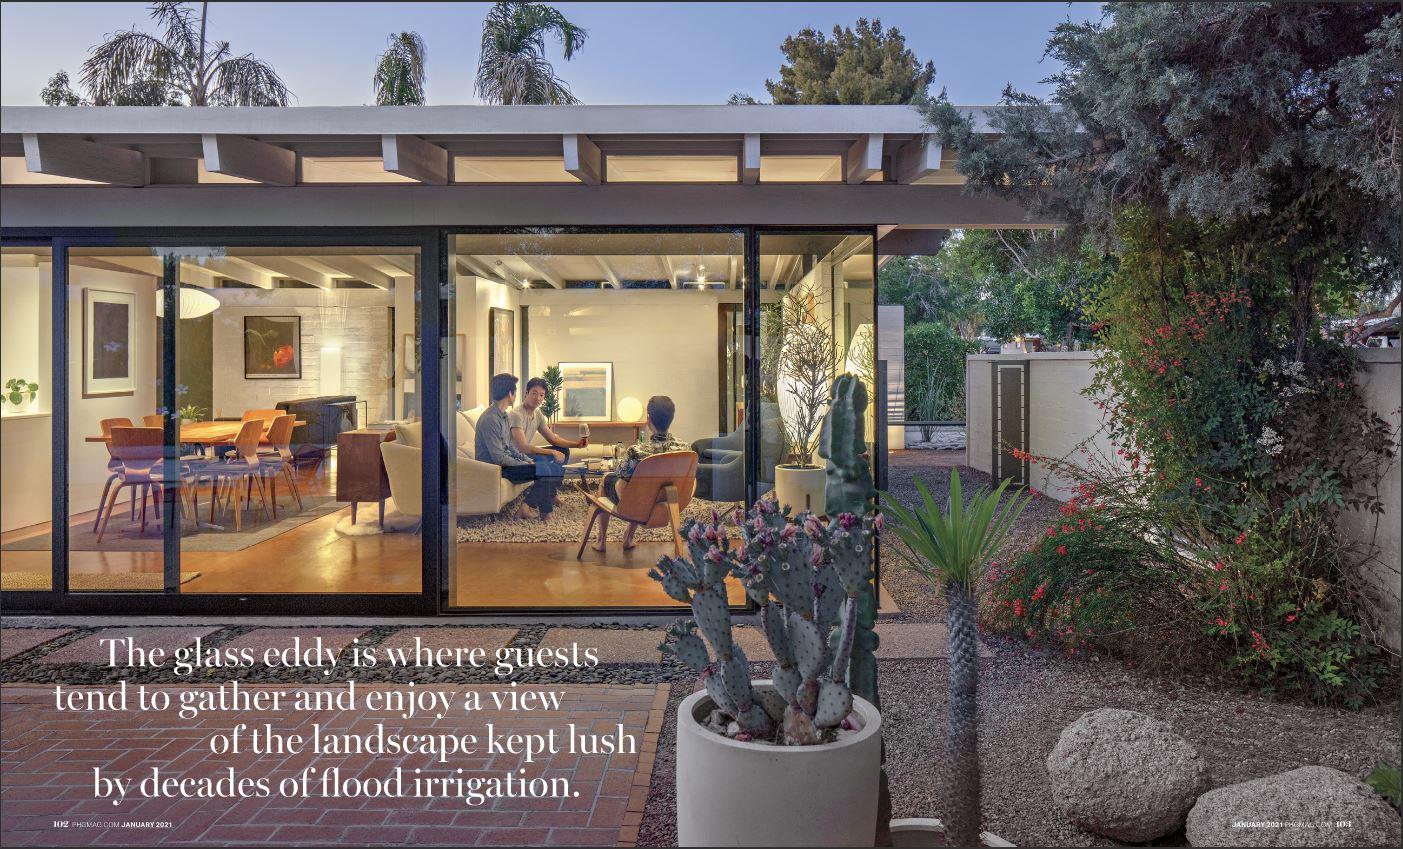 Phoenix Home & Garden: Embracing the New P6